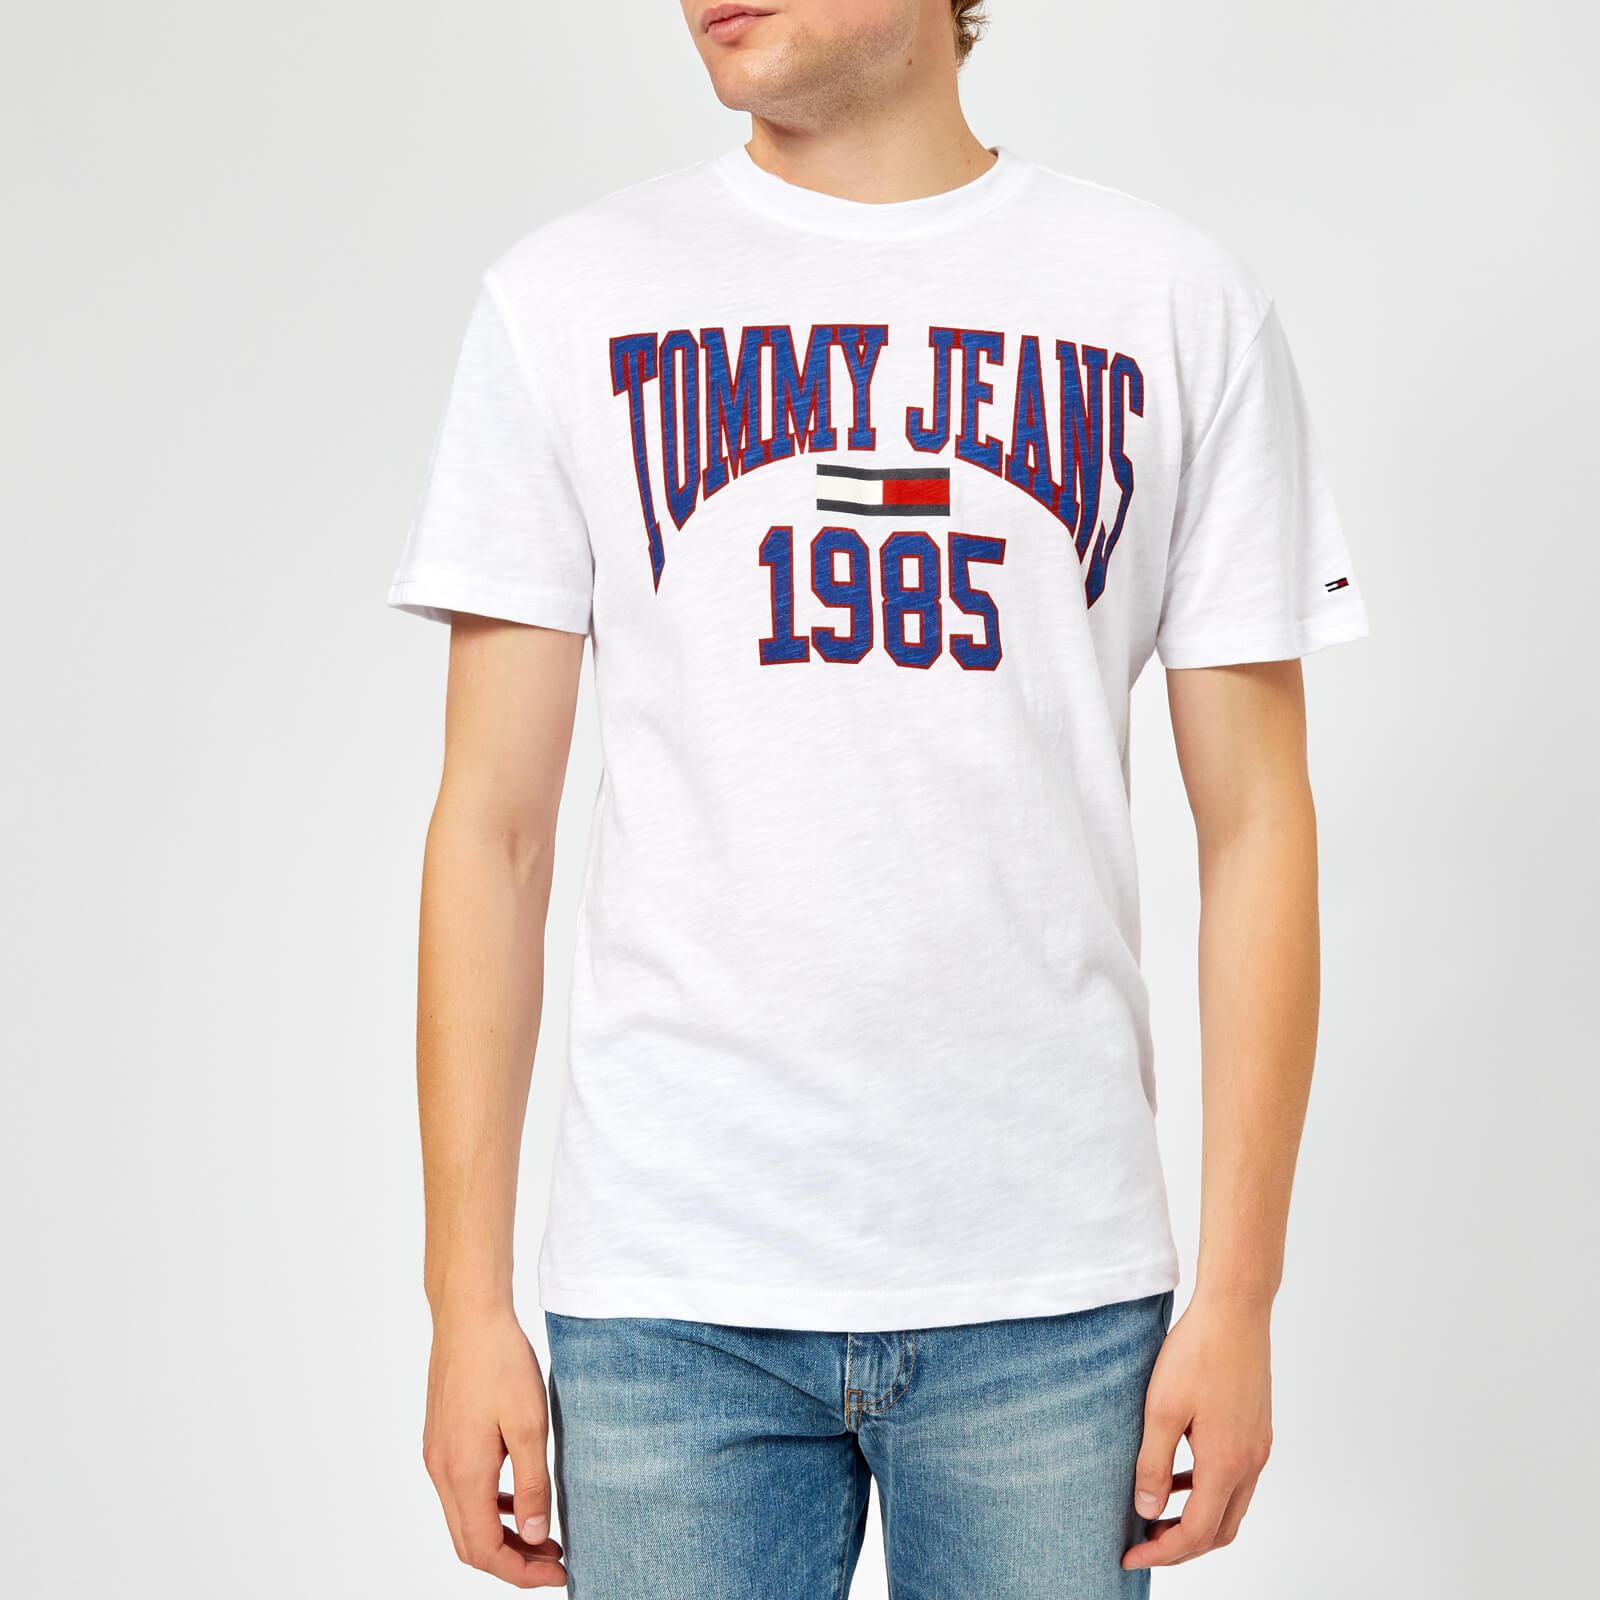 7b45989c Tommy Jeans Men's TJM Collegiate Logo T-Shirt - Classic White Clothing |  TheHut.com